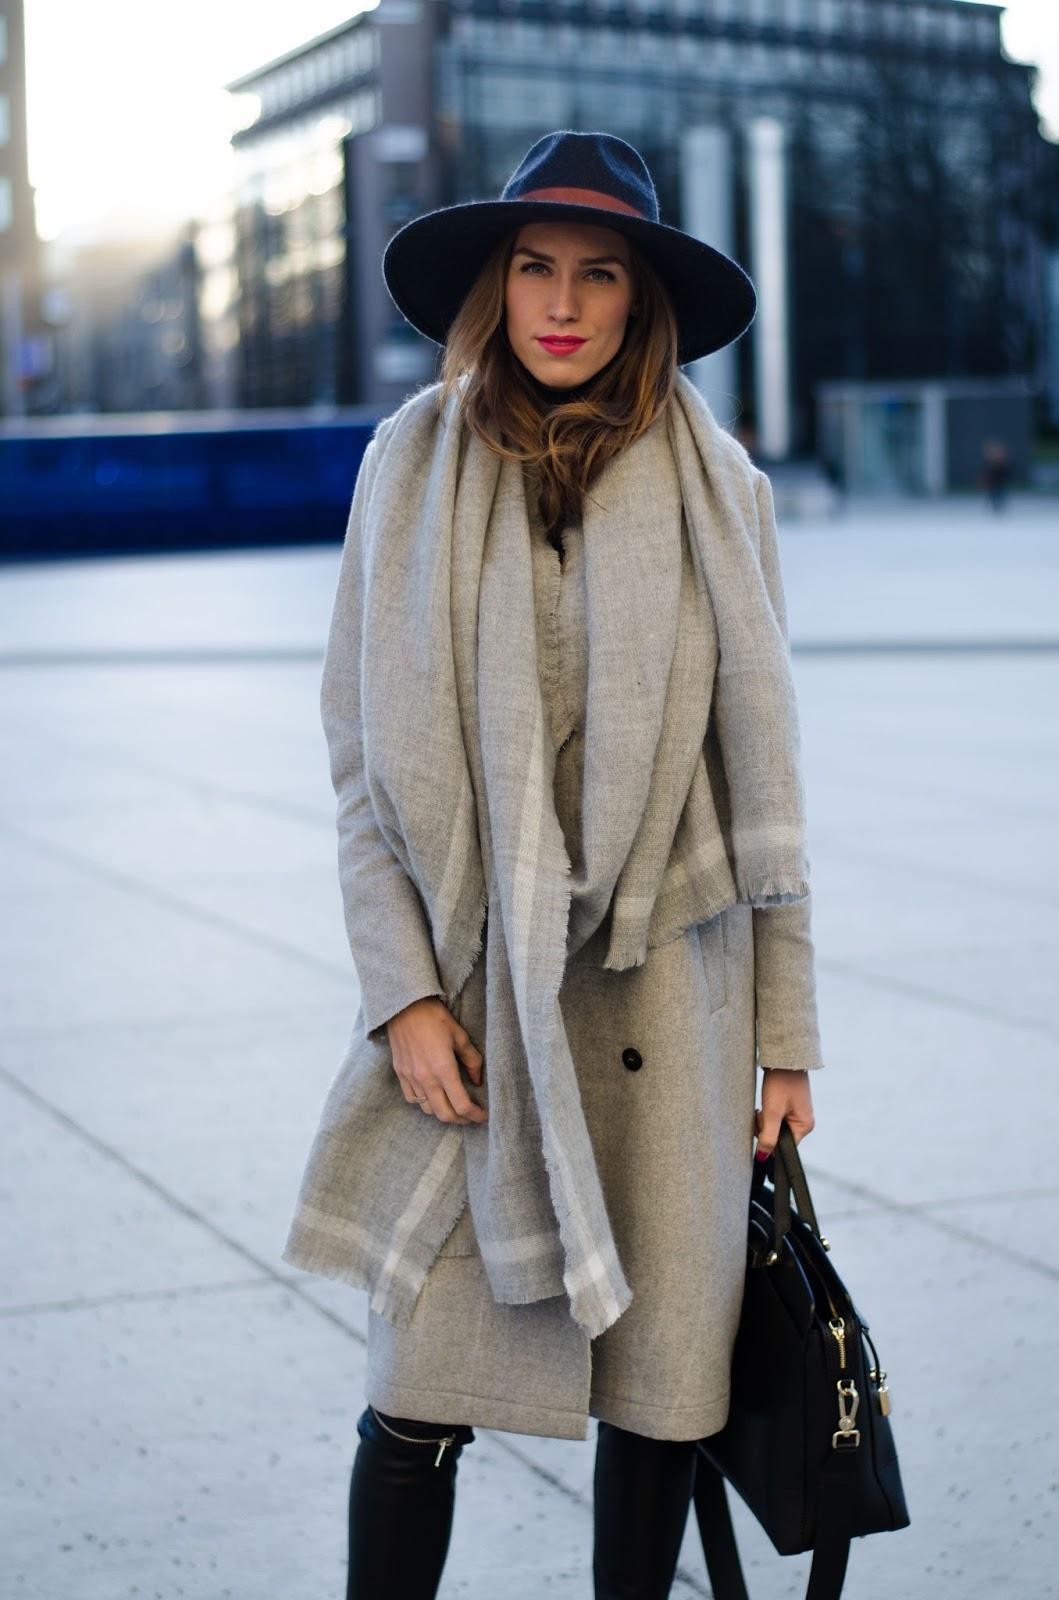 kristjaana mere gray wool coat long scarf fedora hat winter fashion